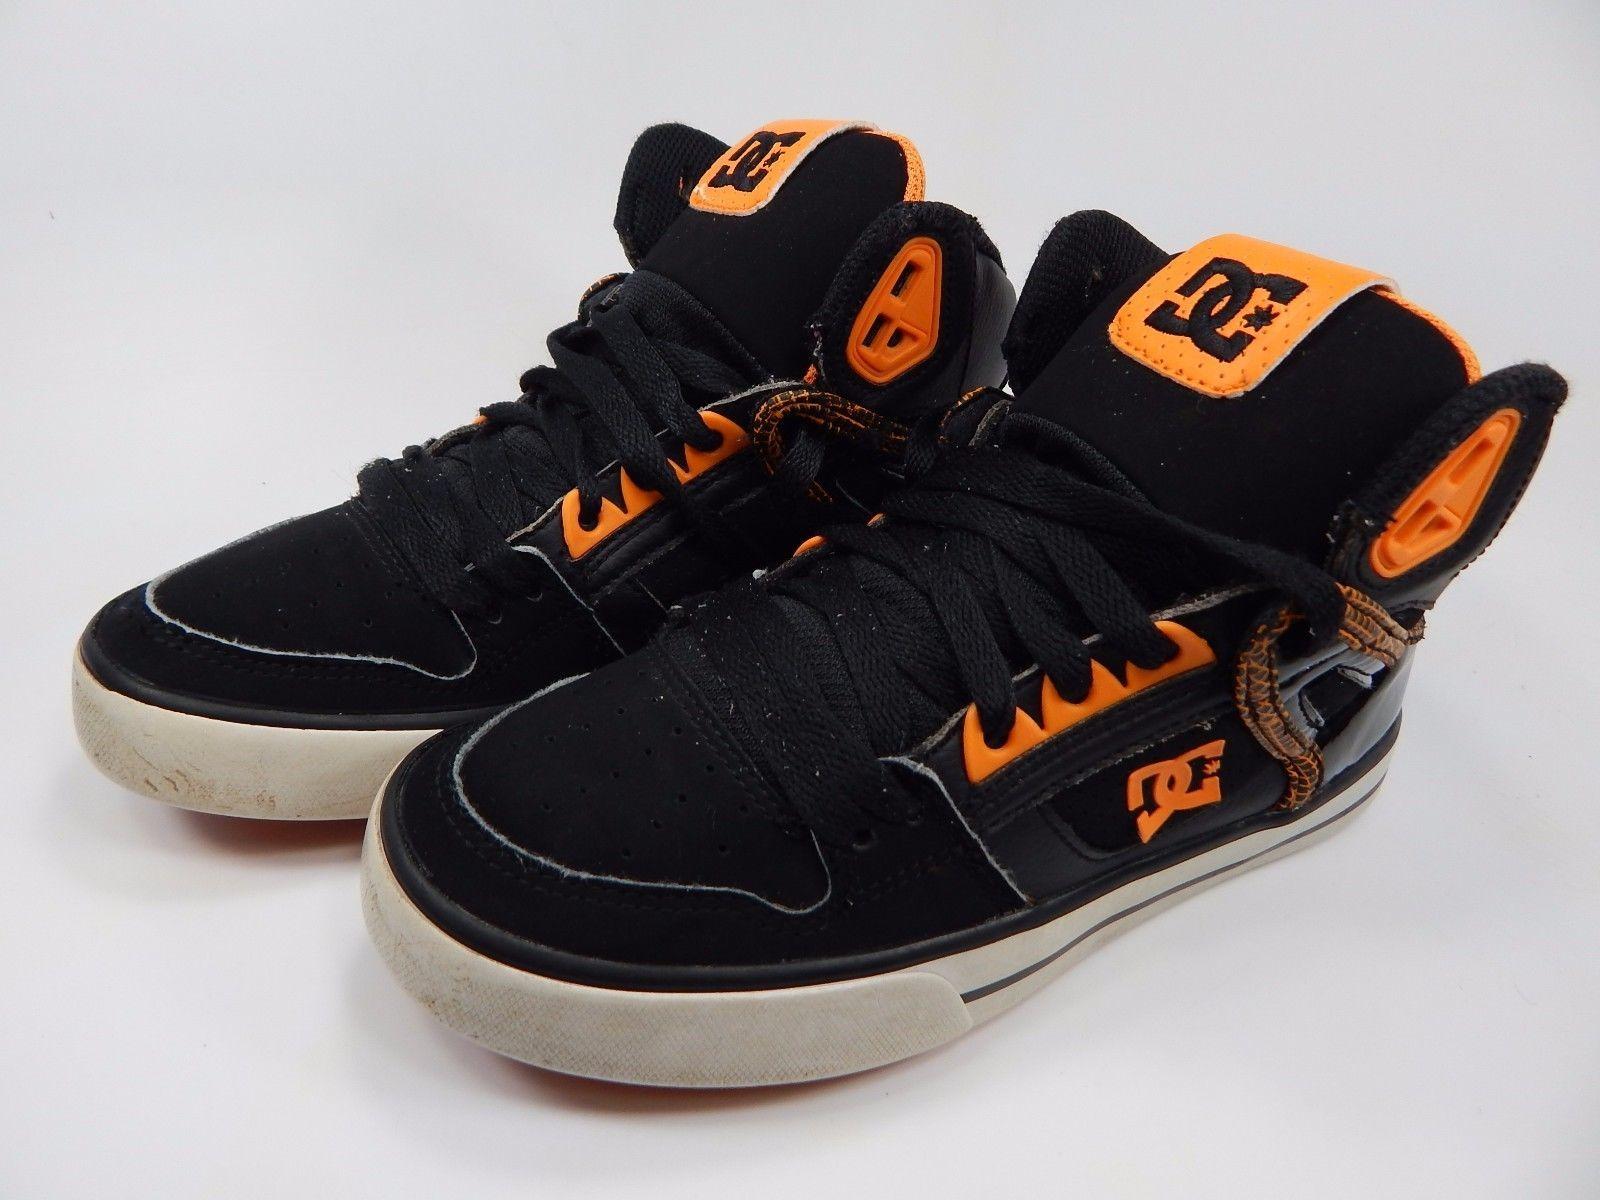 DC Spartan High Men's Boy's Youth Athletic Shoes Size 5 Y (M) EU 37 Black Orange